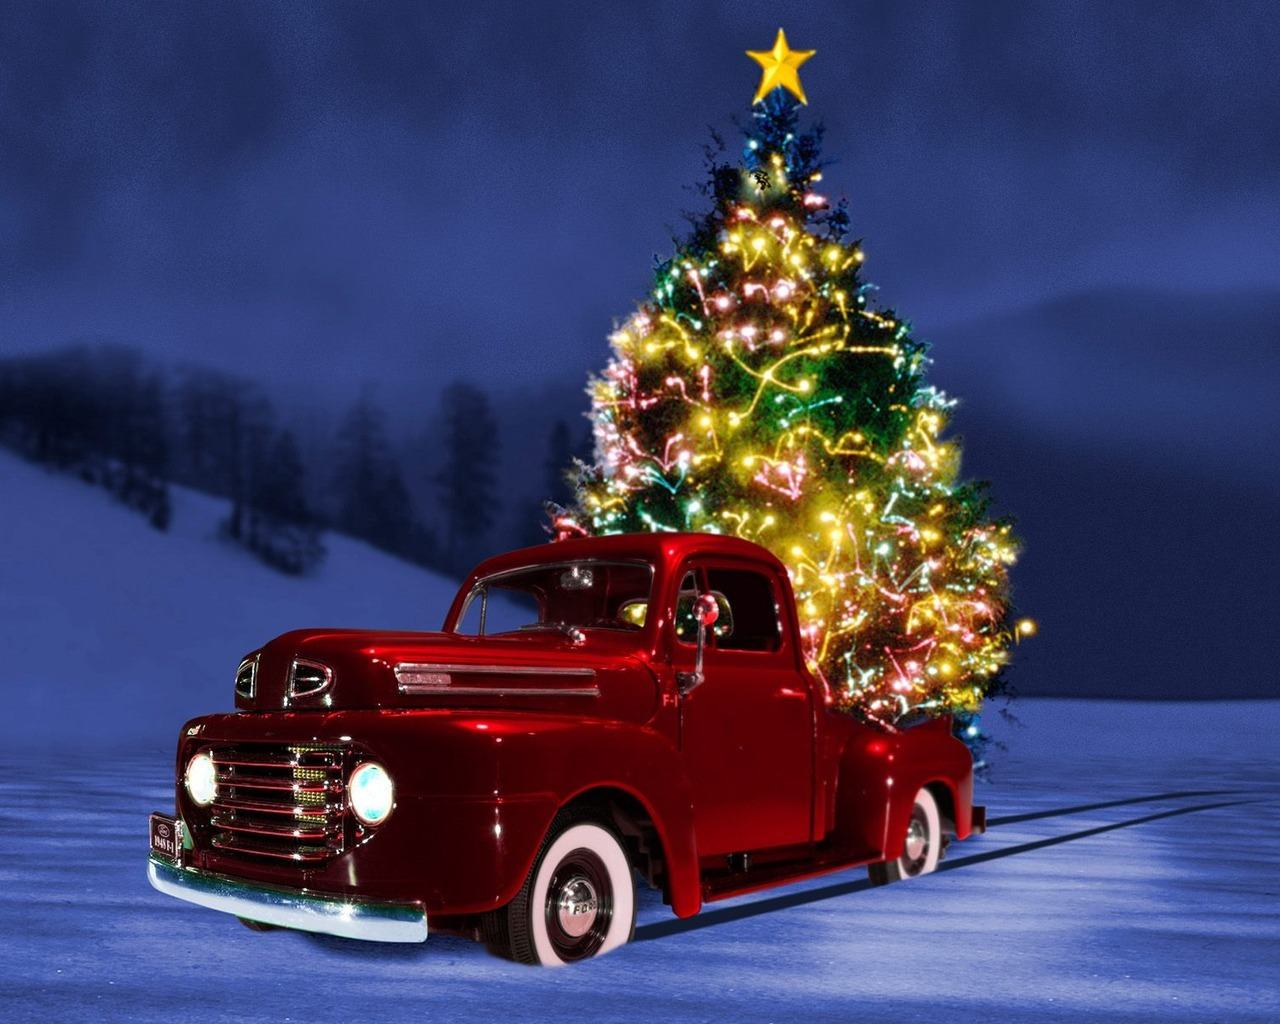 Christmas wallpaper backgrounds christmas wallpaper   Funny 1280x1024